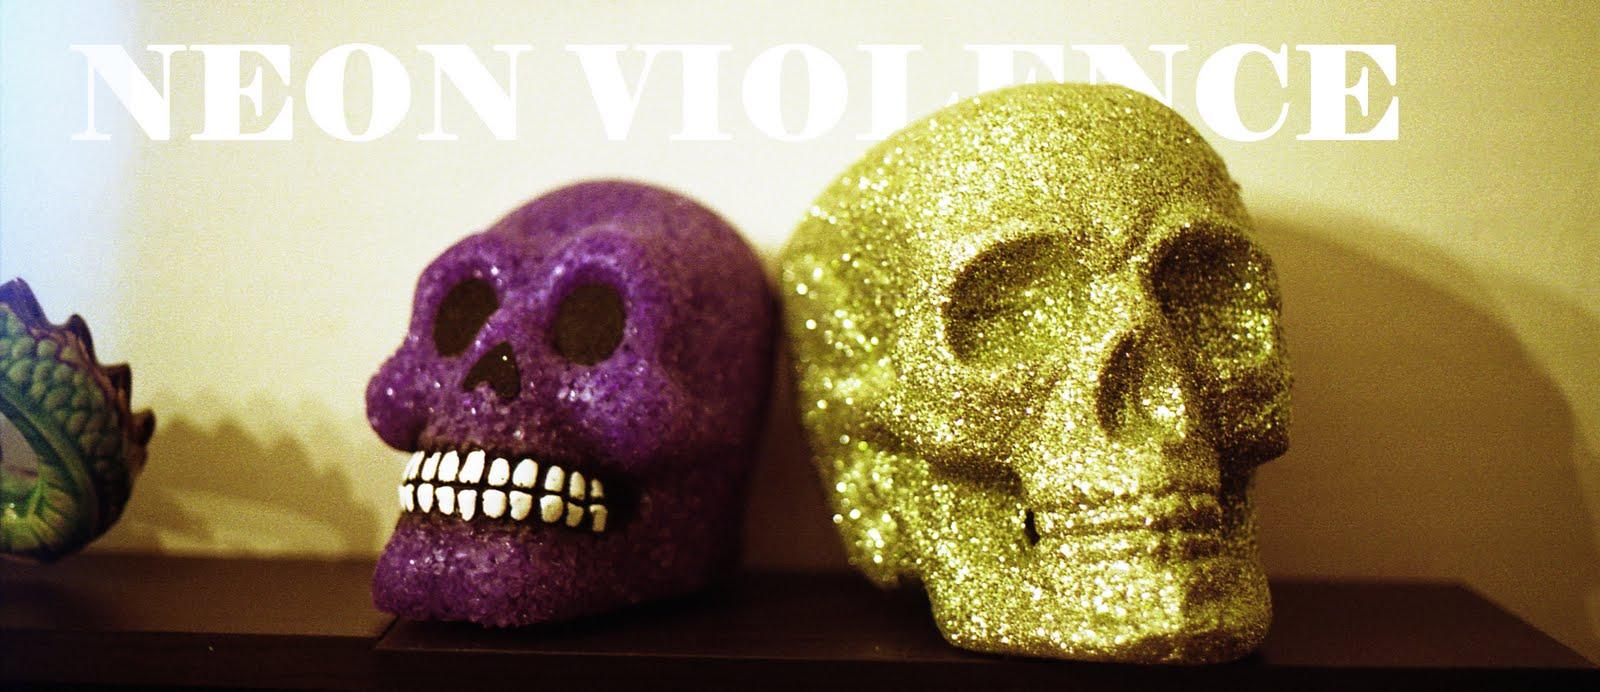 neon violence